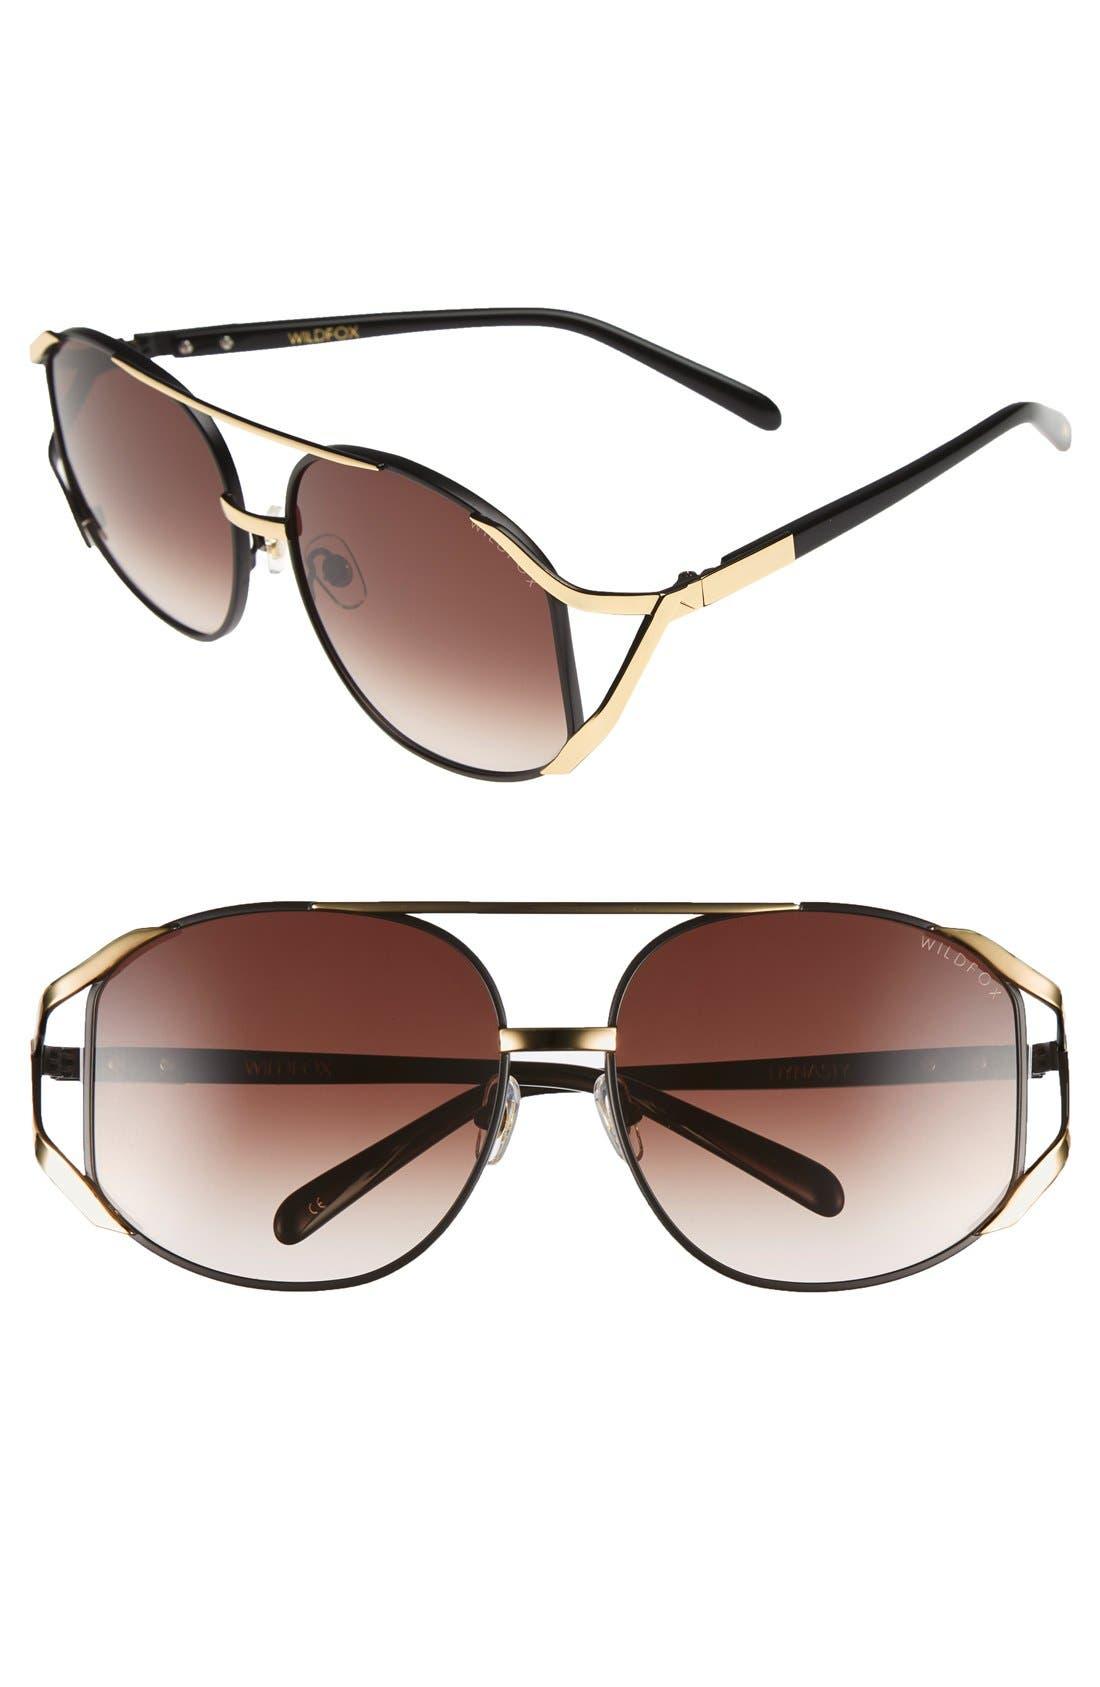 'Dynasty' 59mm Retro Sunglasses,                             Main thumbnail 1, color,                             007